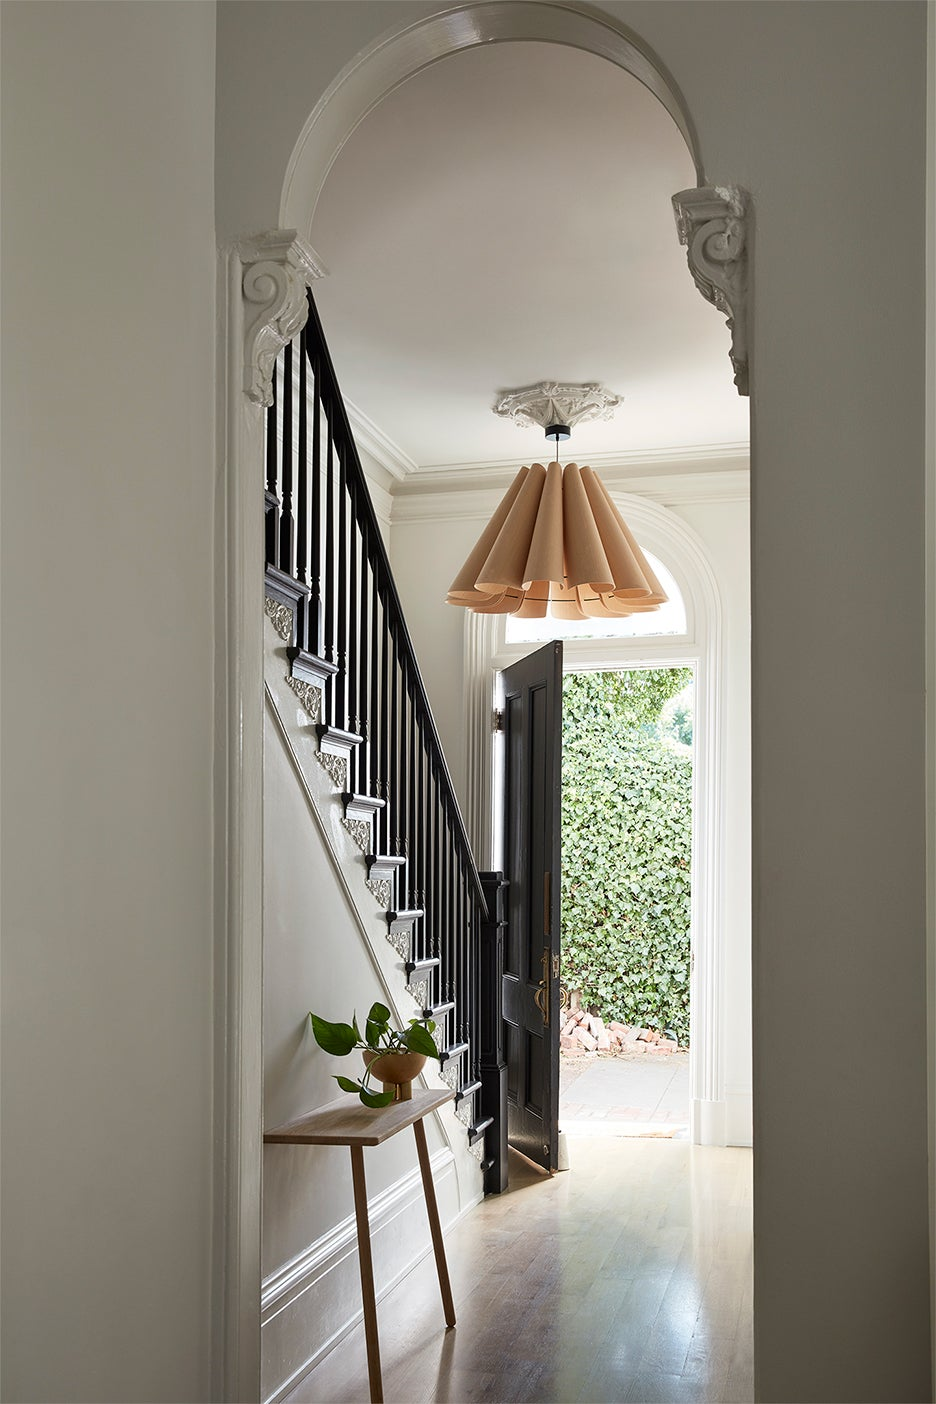 Statement lighting fixture in a entryway